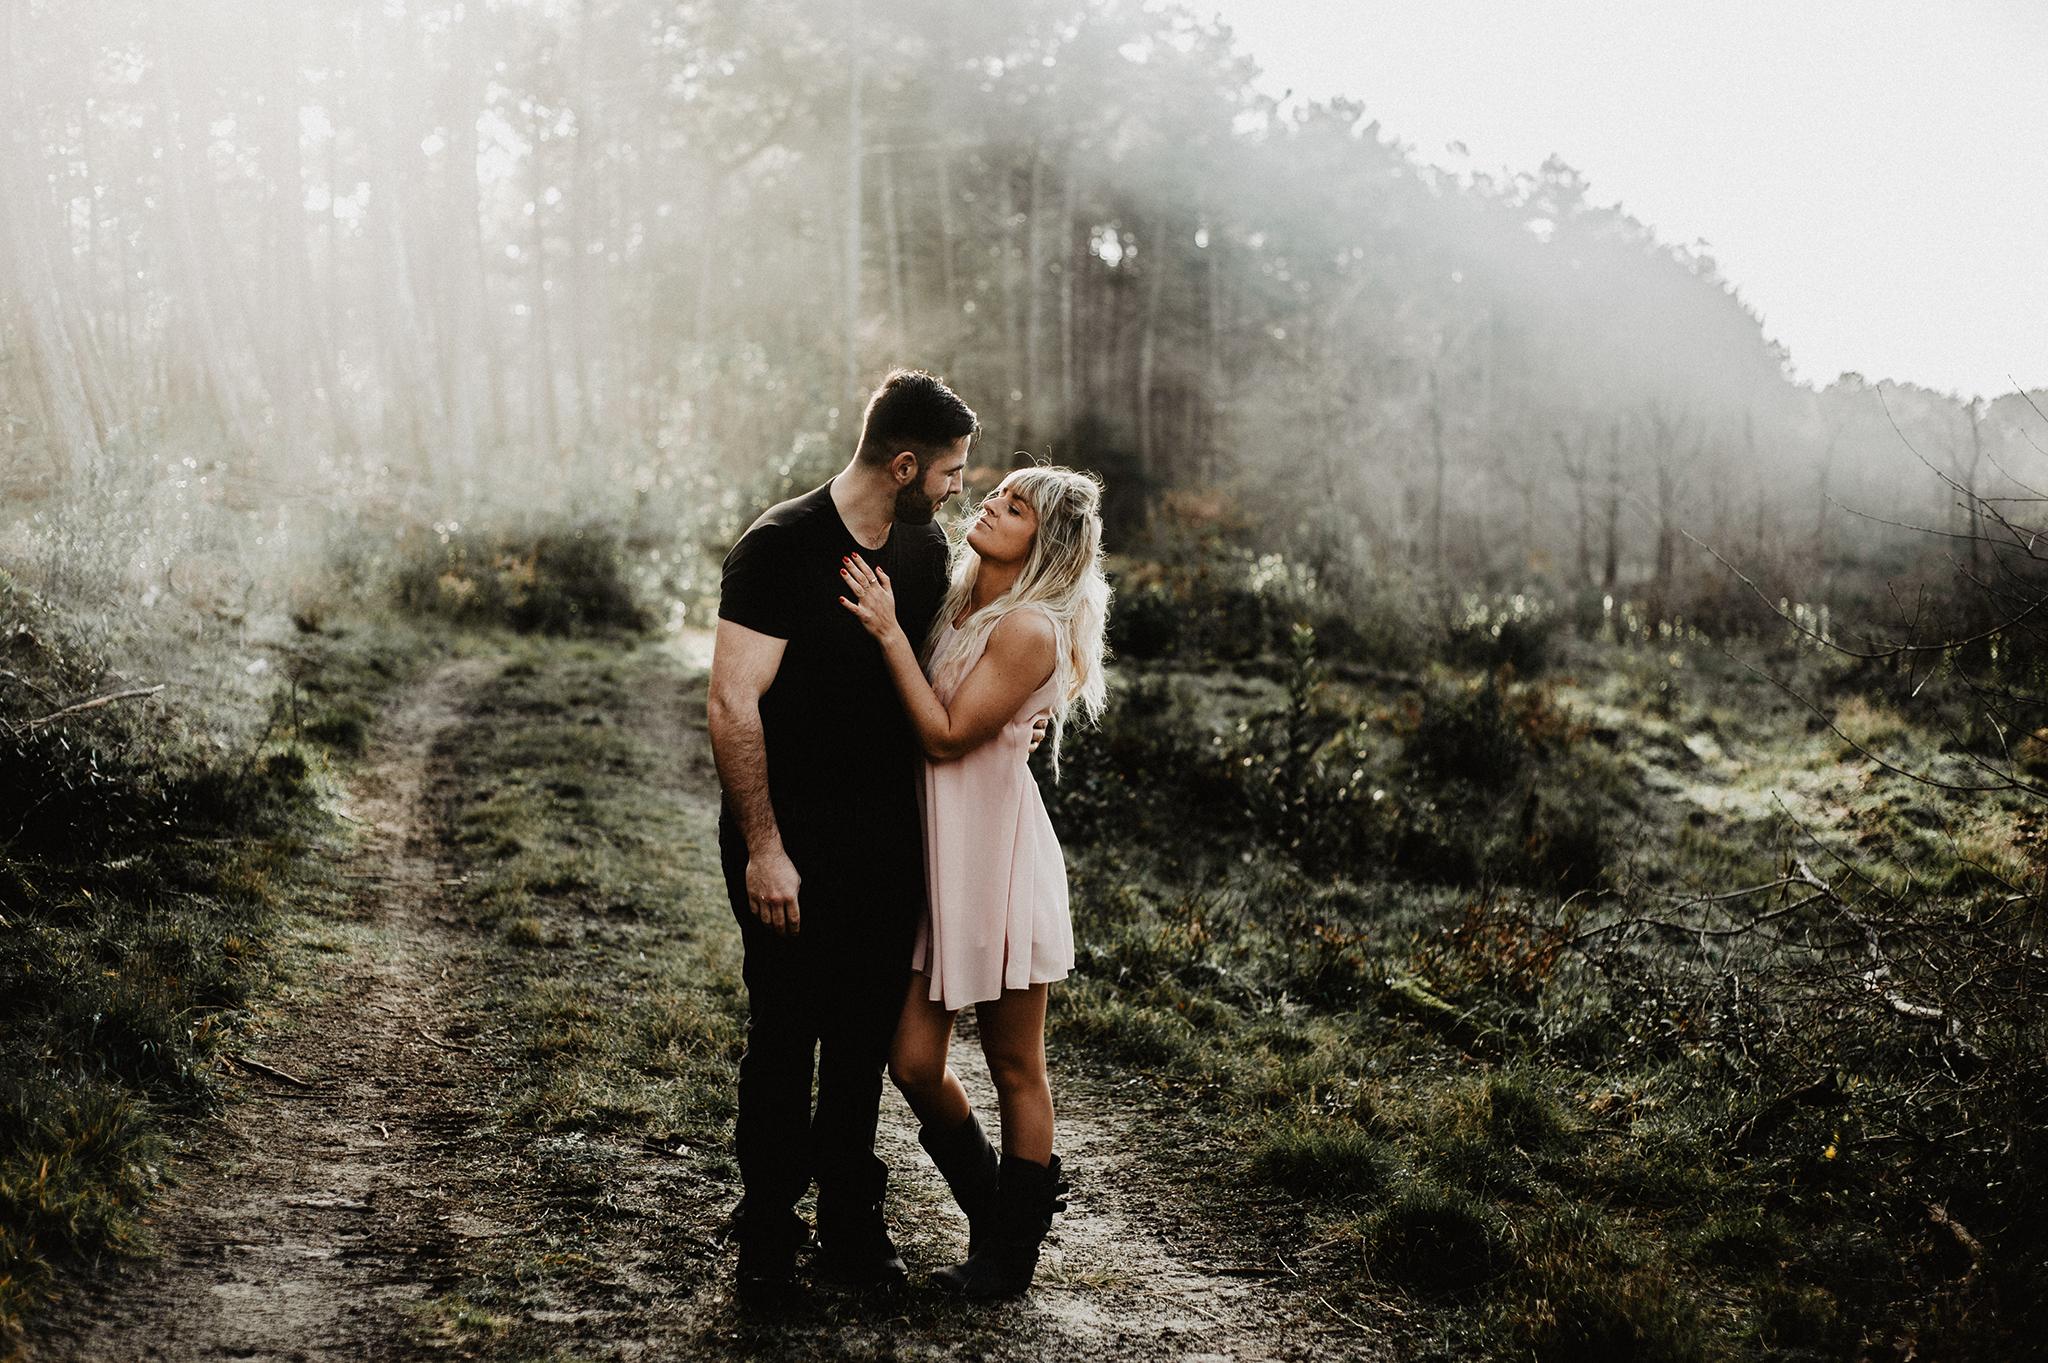 Harleena Photography